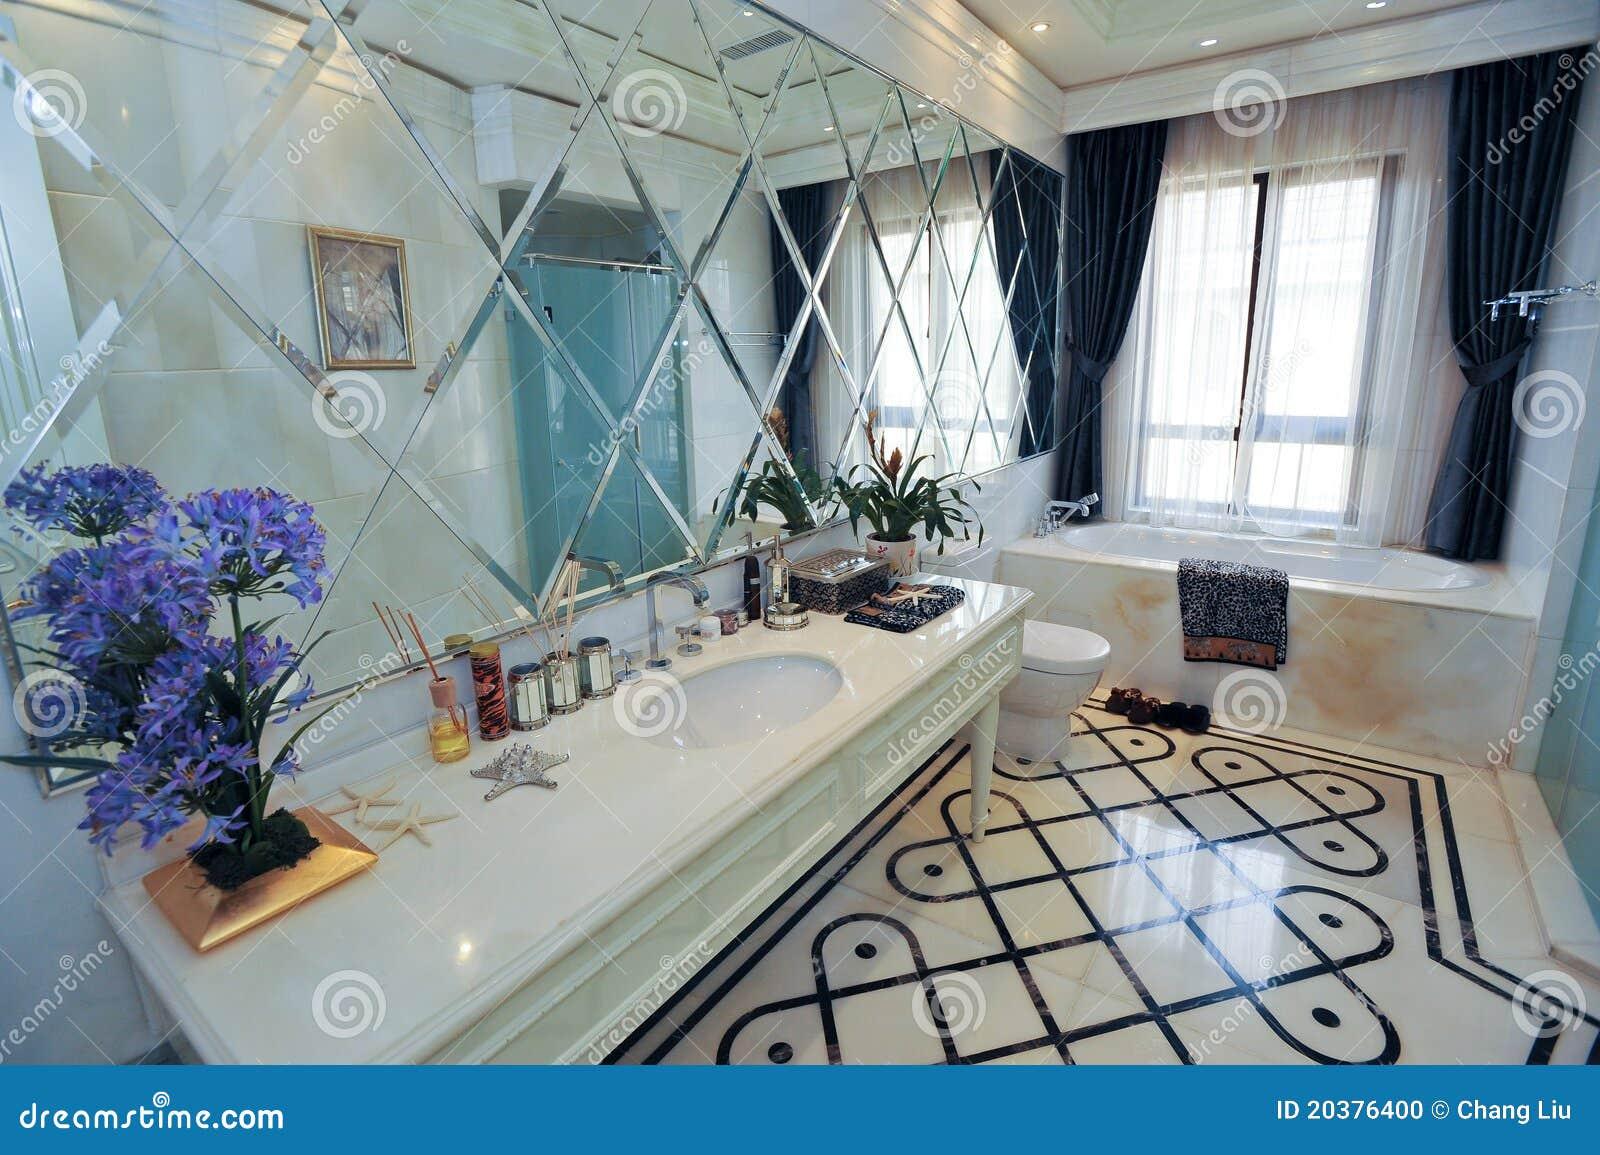 Mirrior branco e azul de bathroom.marble bathtub.blue flower.modern  #39456F 1300x955 Banheiro Azul E Branco